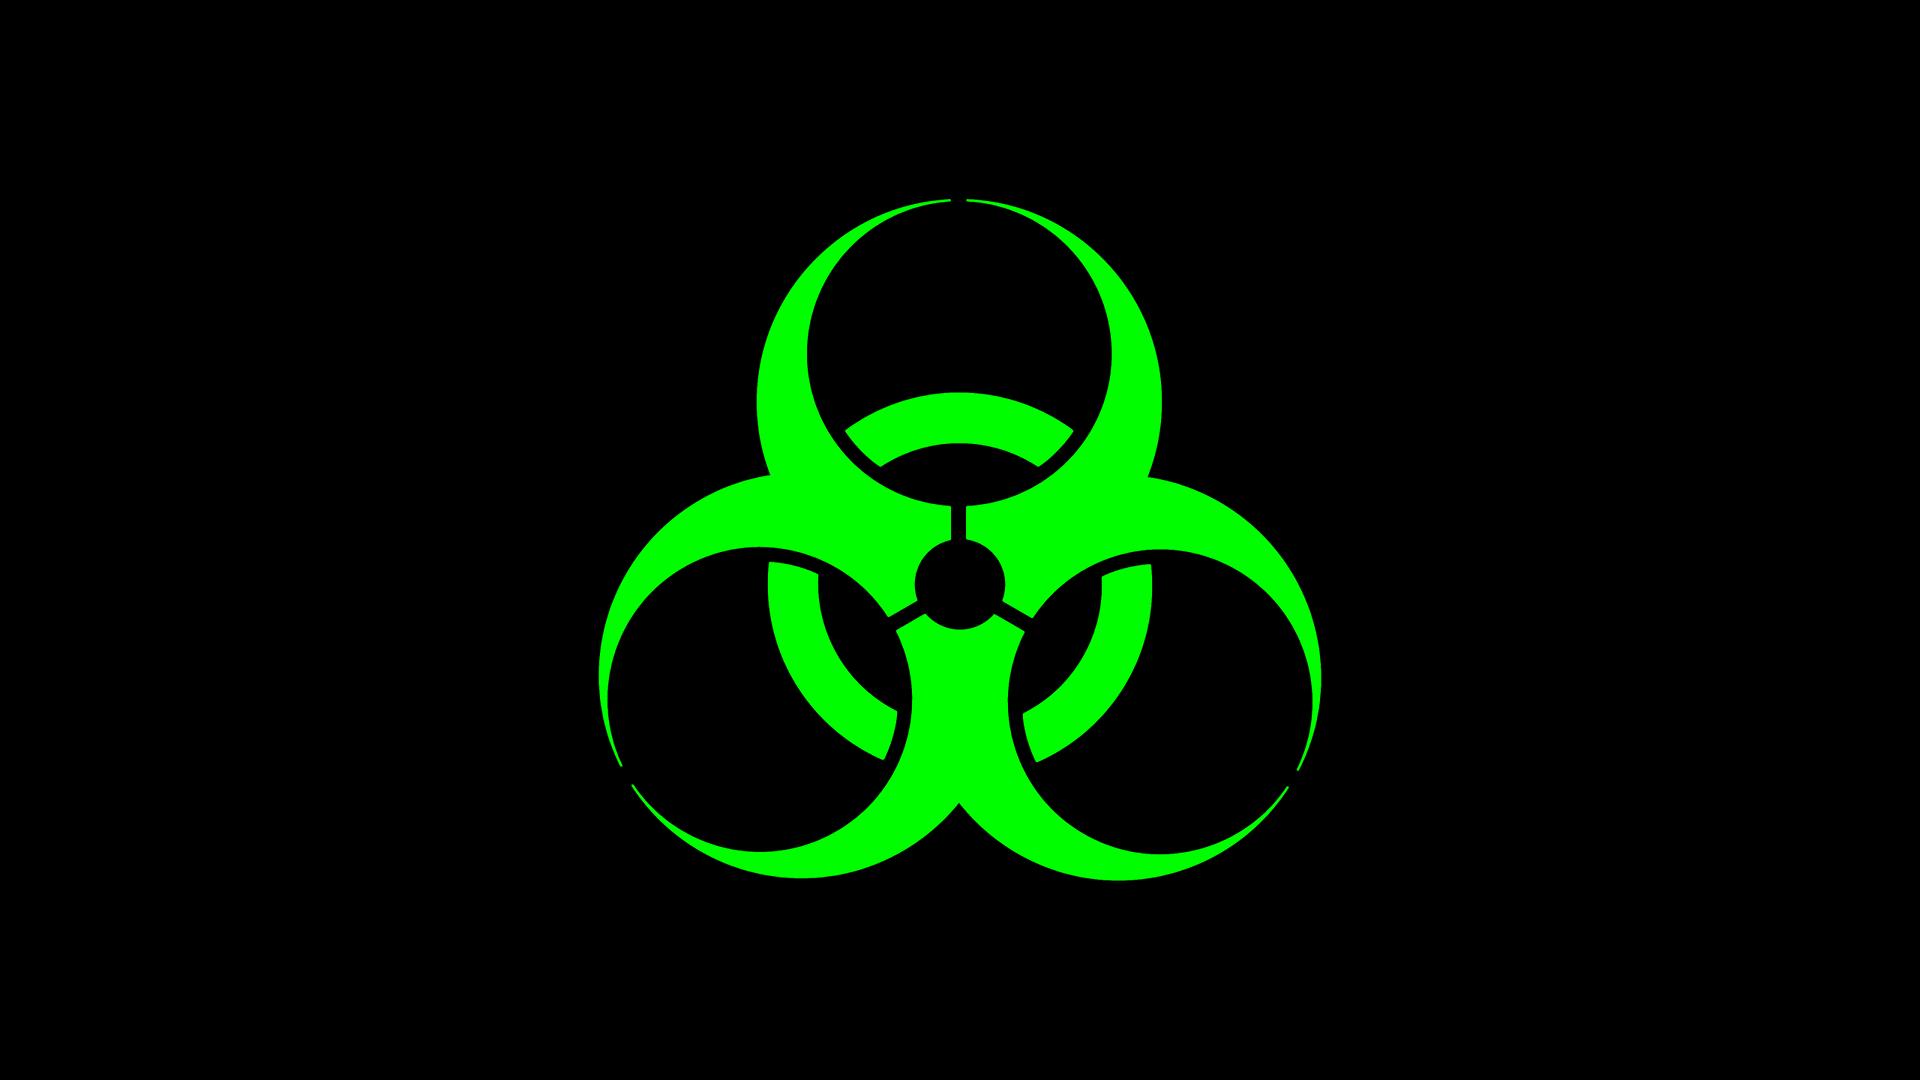 High Resolution Wallpaper   Biohazard 1920x1080 px